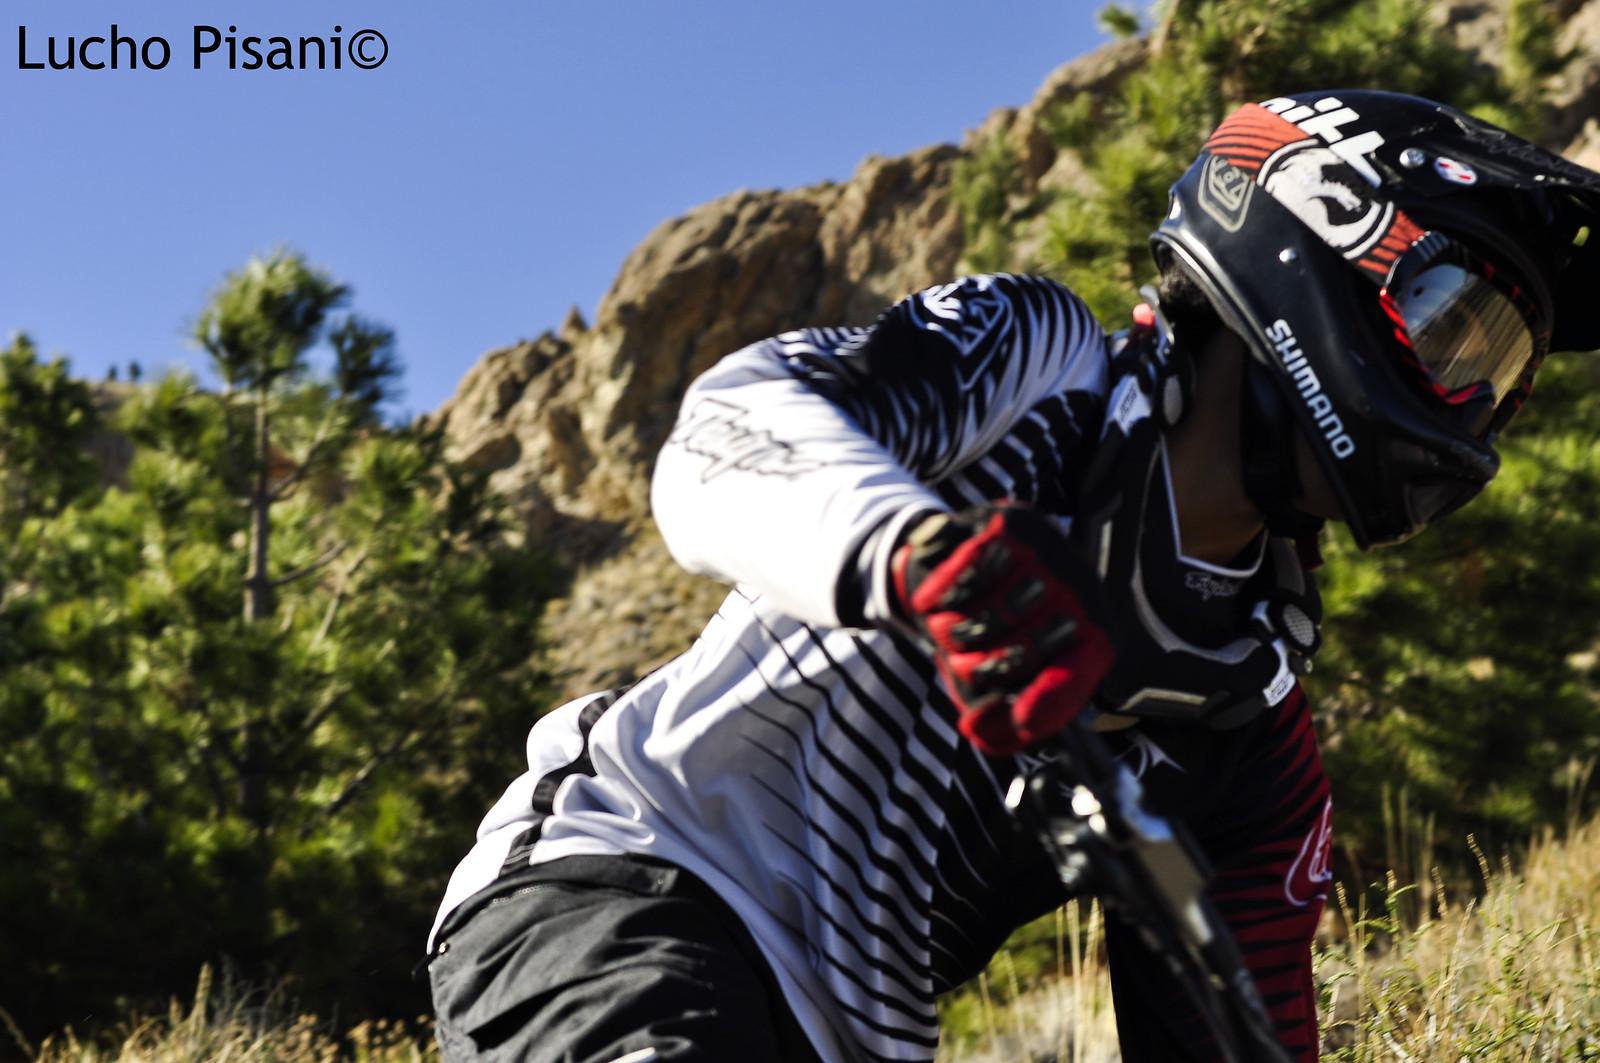 in te curve tr - lucho.pisani - Mountain Biking Pictures - Vital MTB